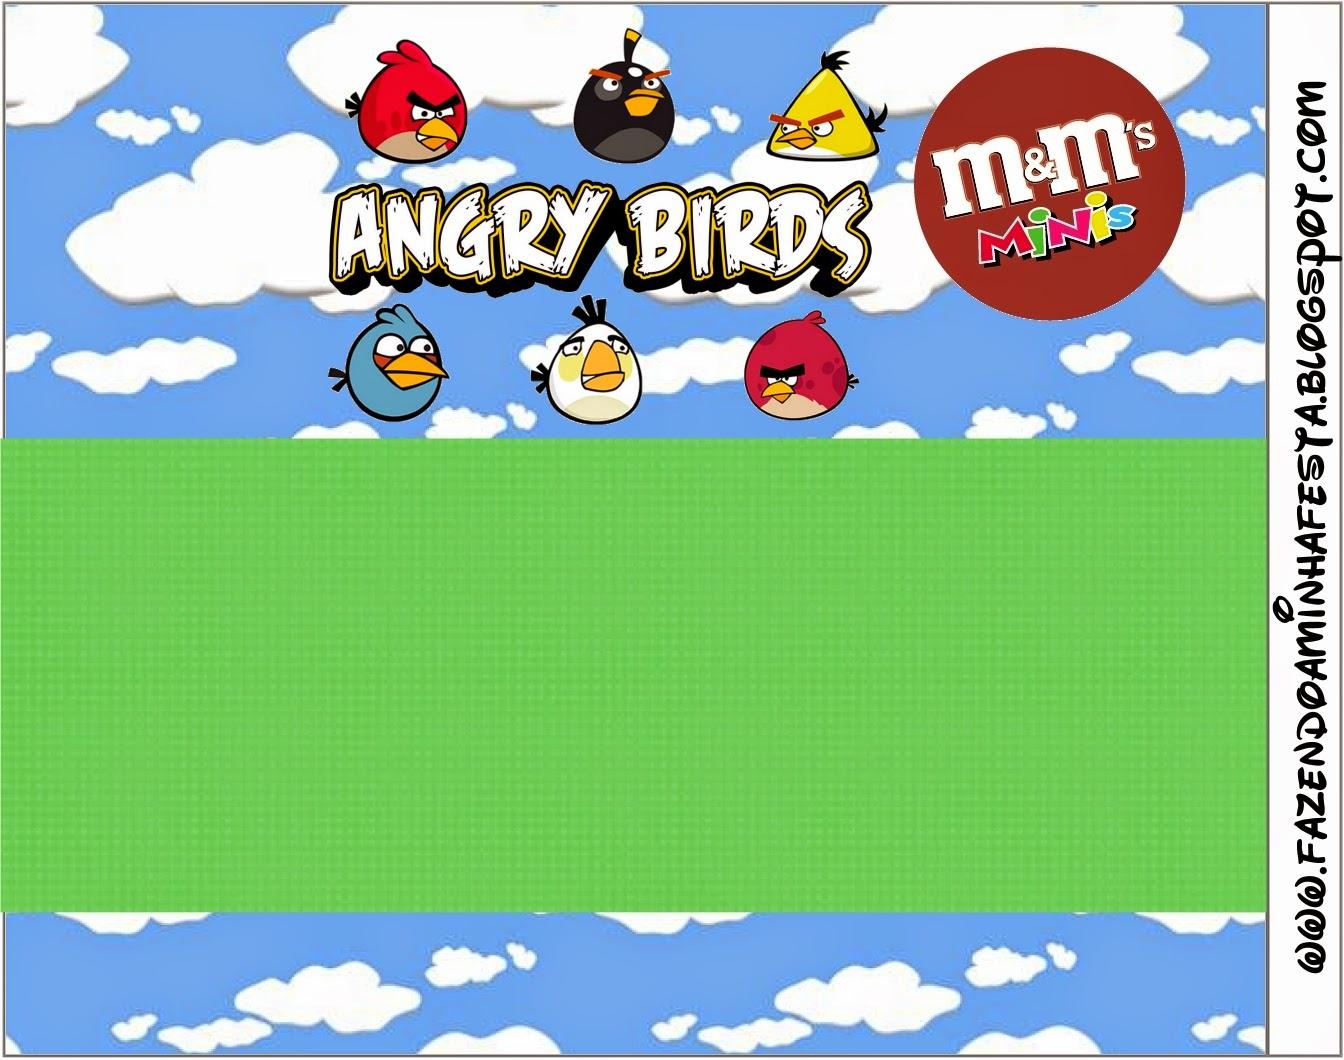 Etiquetas M&M de Angry birds con Nubes para imprimir gratis.